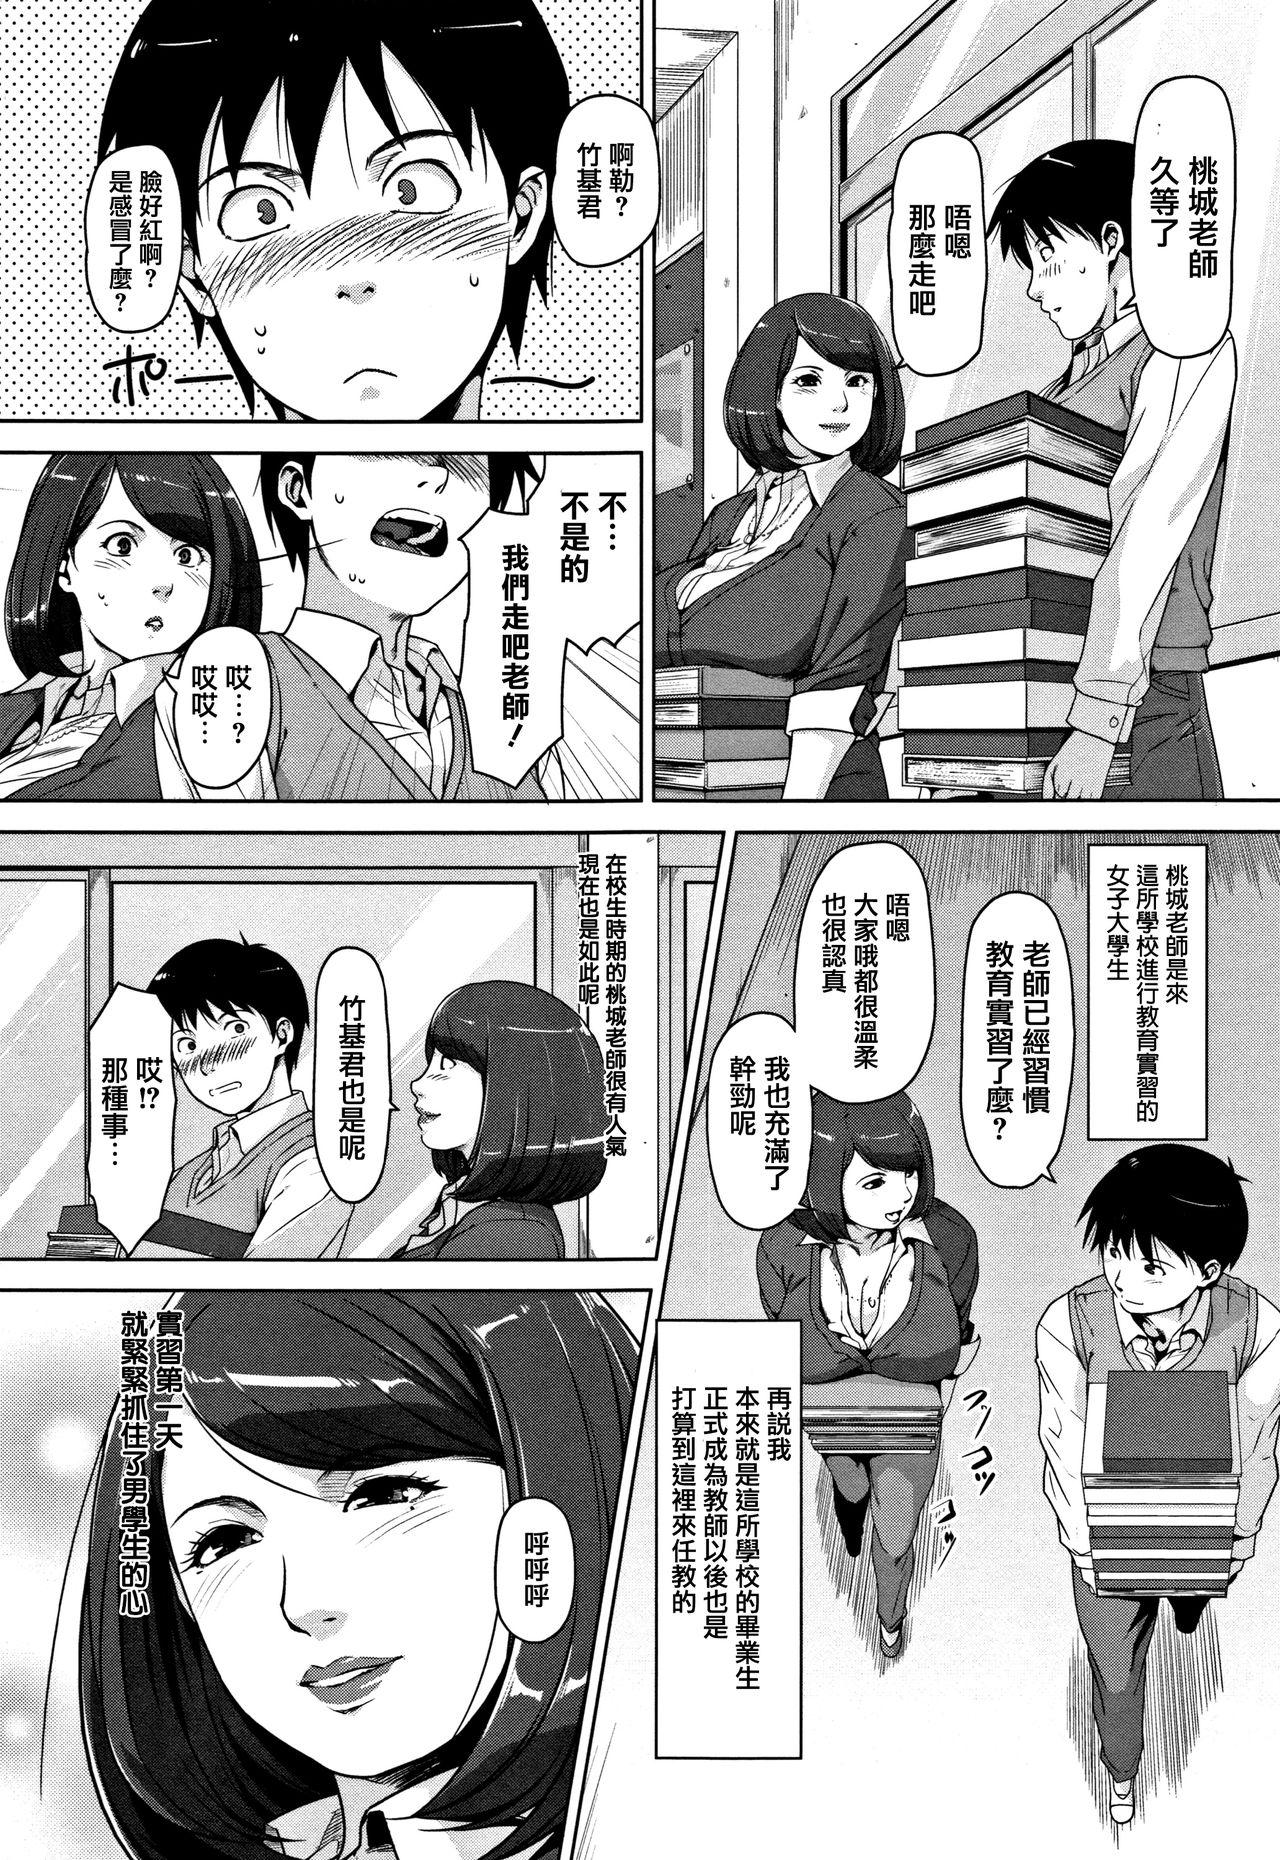 Kanjyuku Chijyo 140